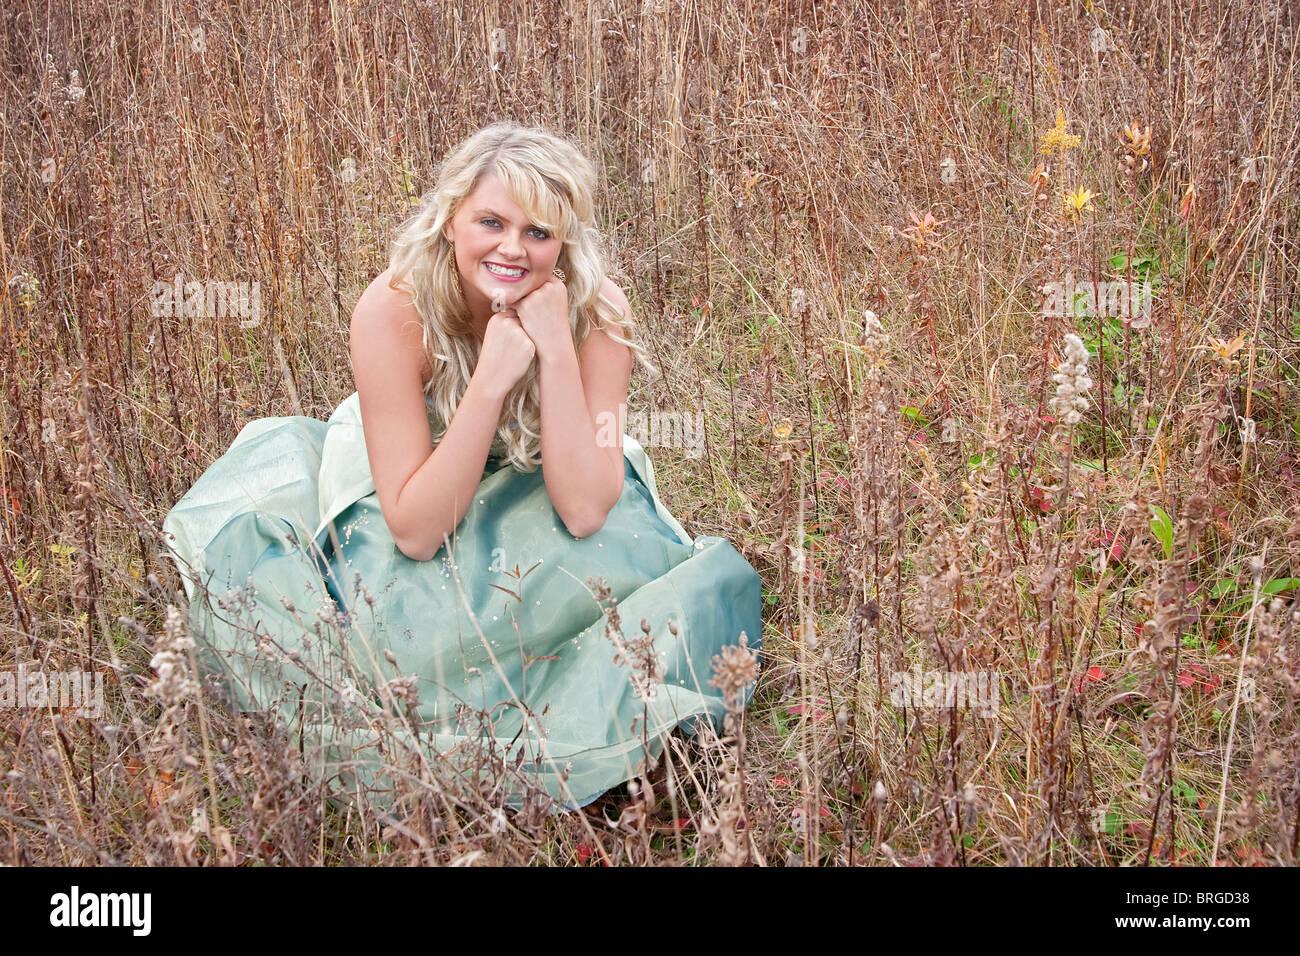 Beautiful Blonde In Evening Gown Stockfotos & Beautiful Blonde In ...